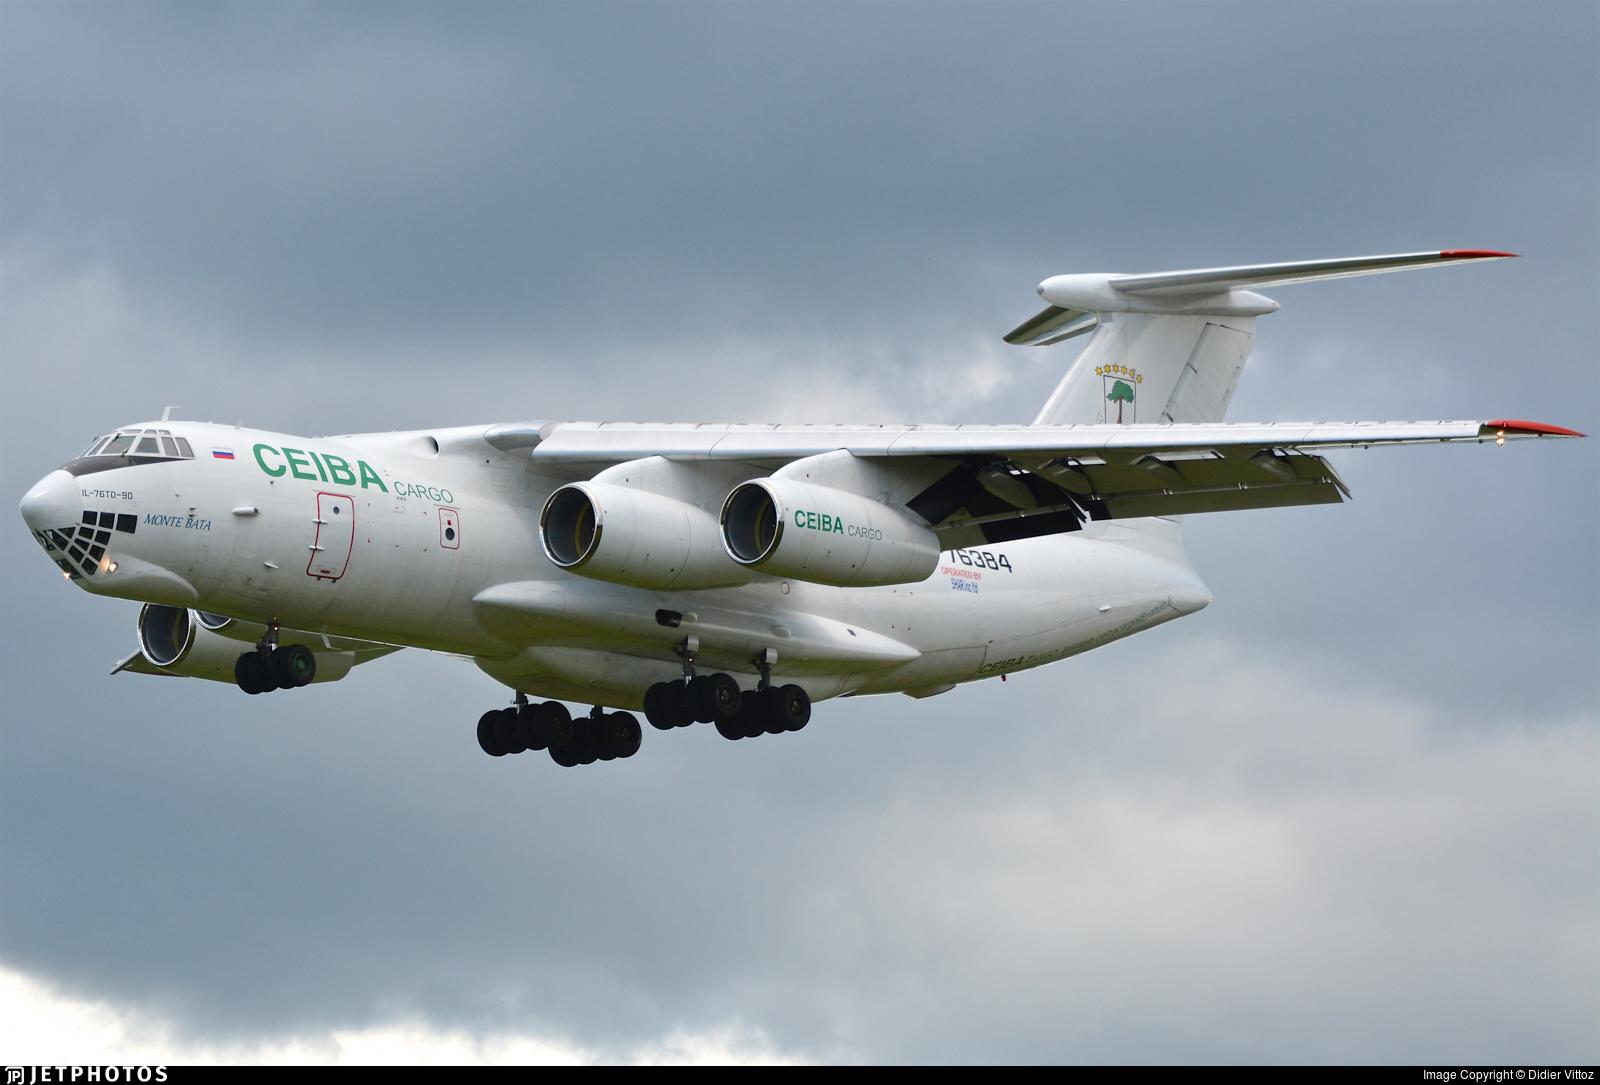 RA-76384 - Ilyushin IL-76TD-90VD - Ceiba Intercontinental Airlines Cargo